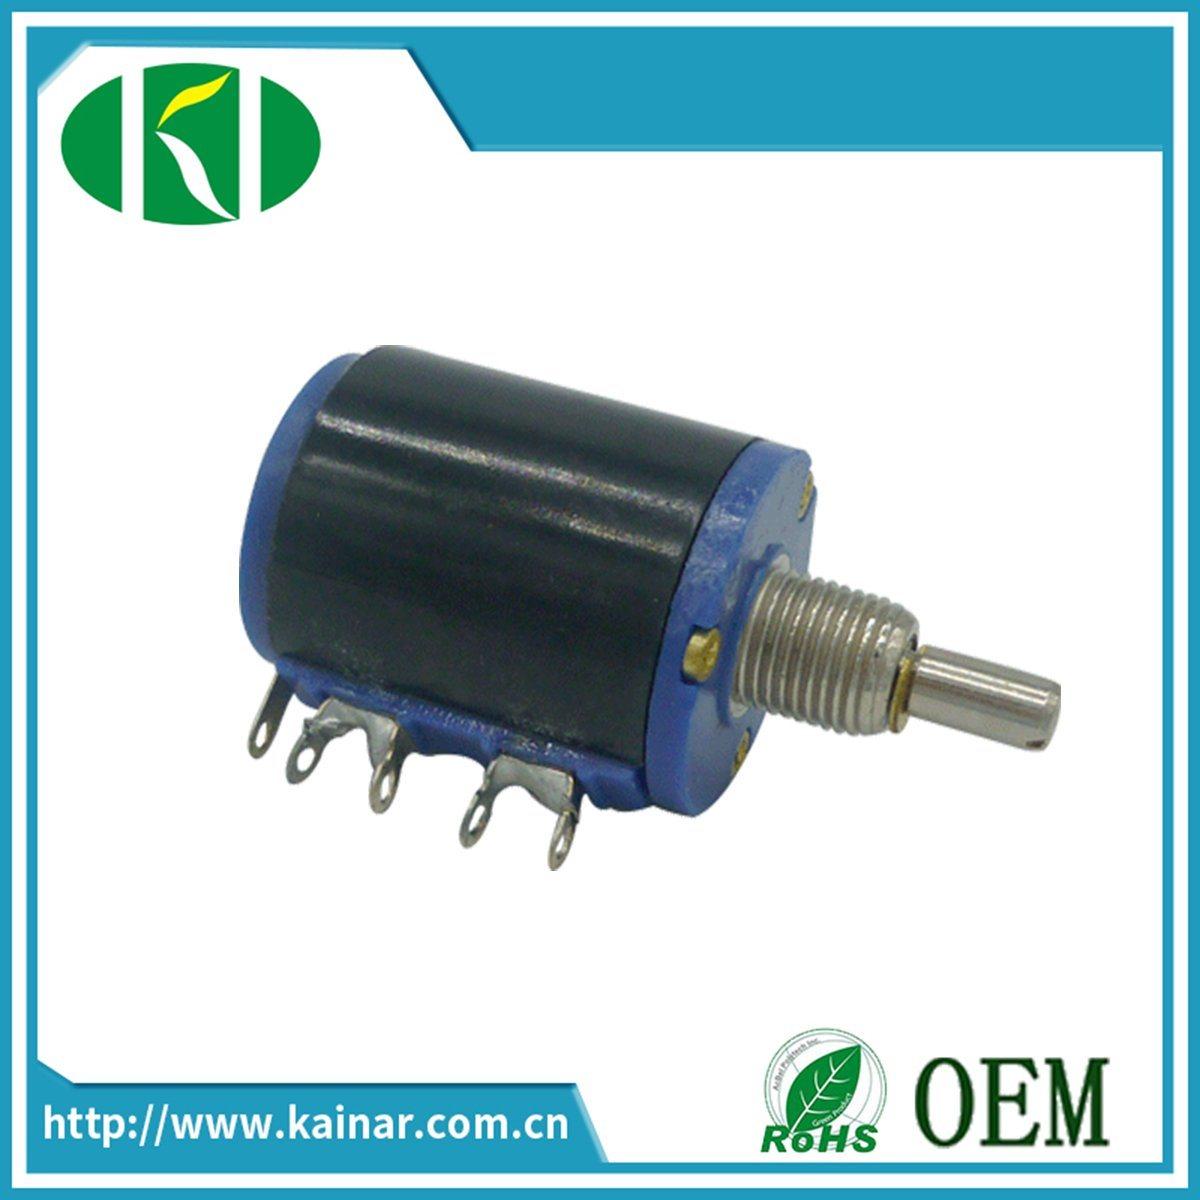 Wxd3-12 5 Turns Precision Wirewound Potentiometer